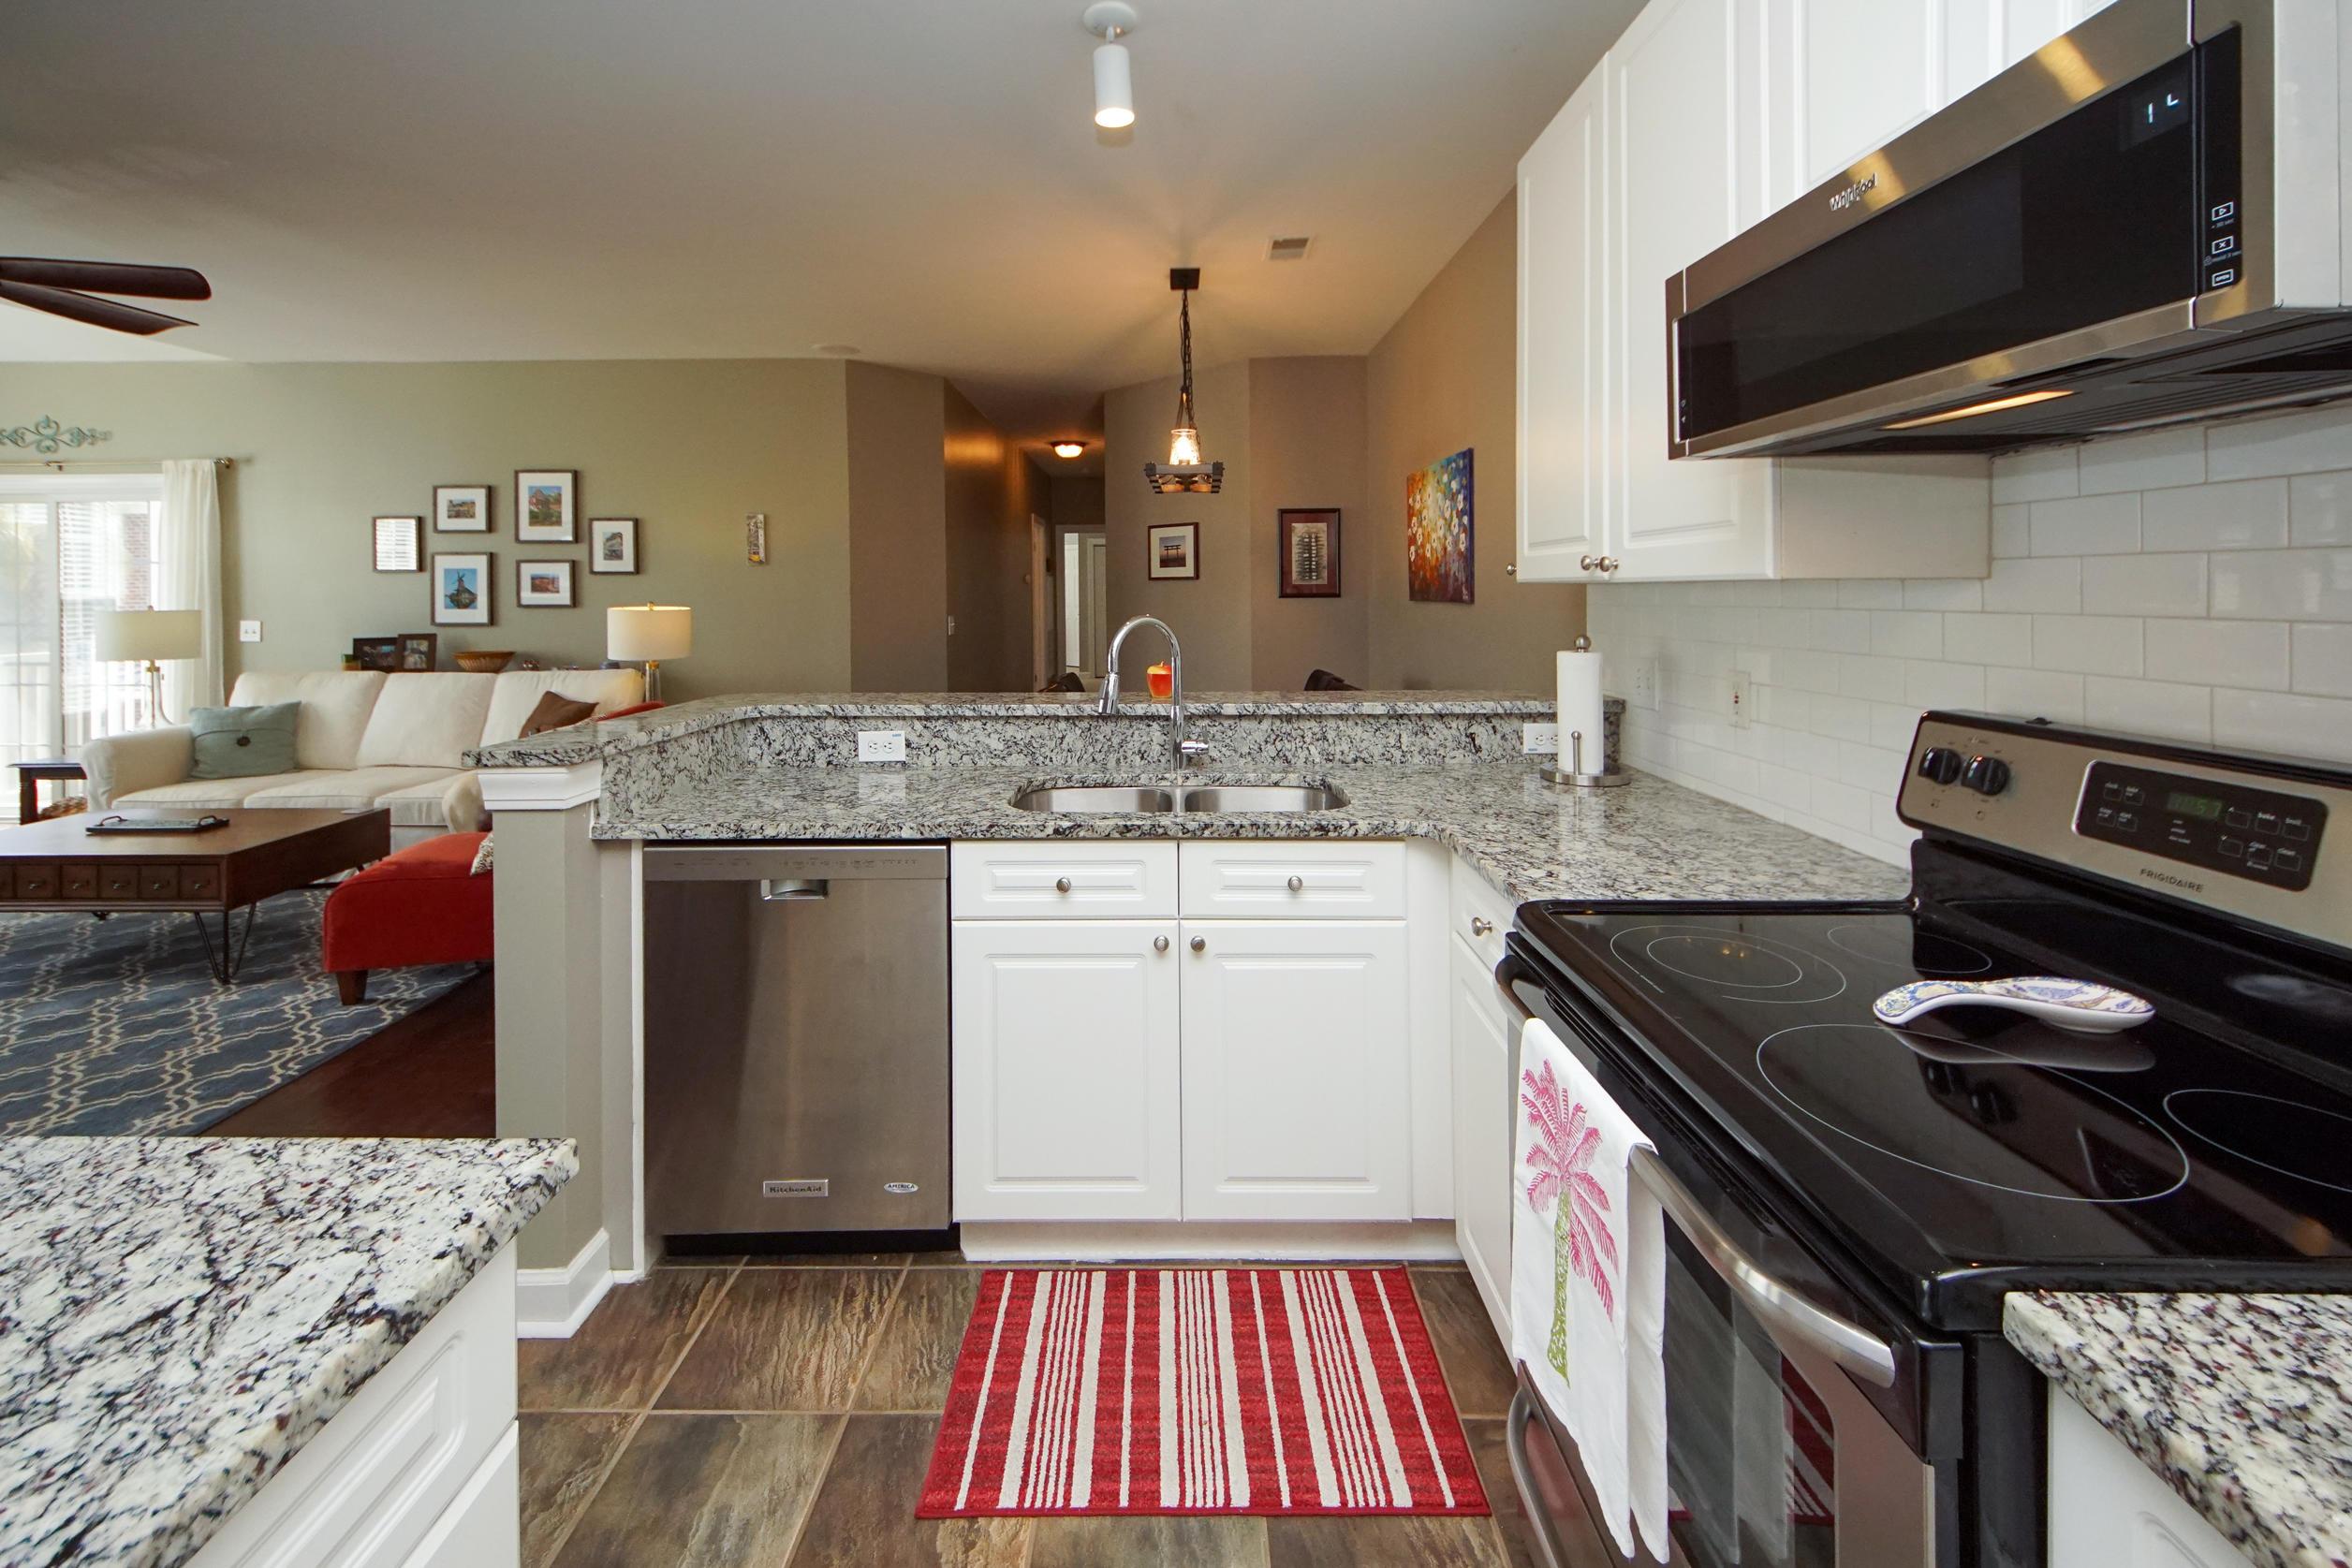 Dunes West Homes For Sale - 1631 Camfield, Mount Pleasant, SC - 3